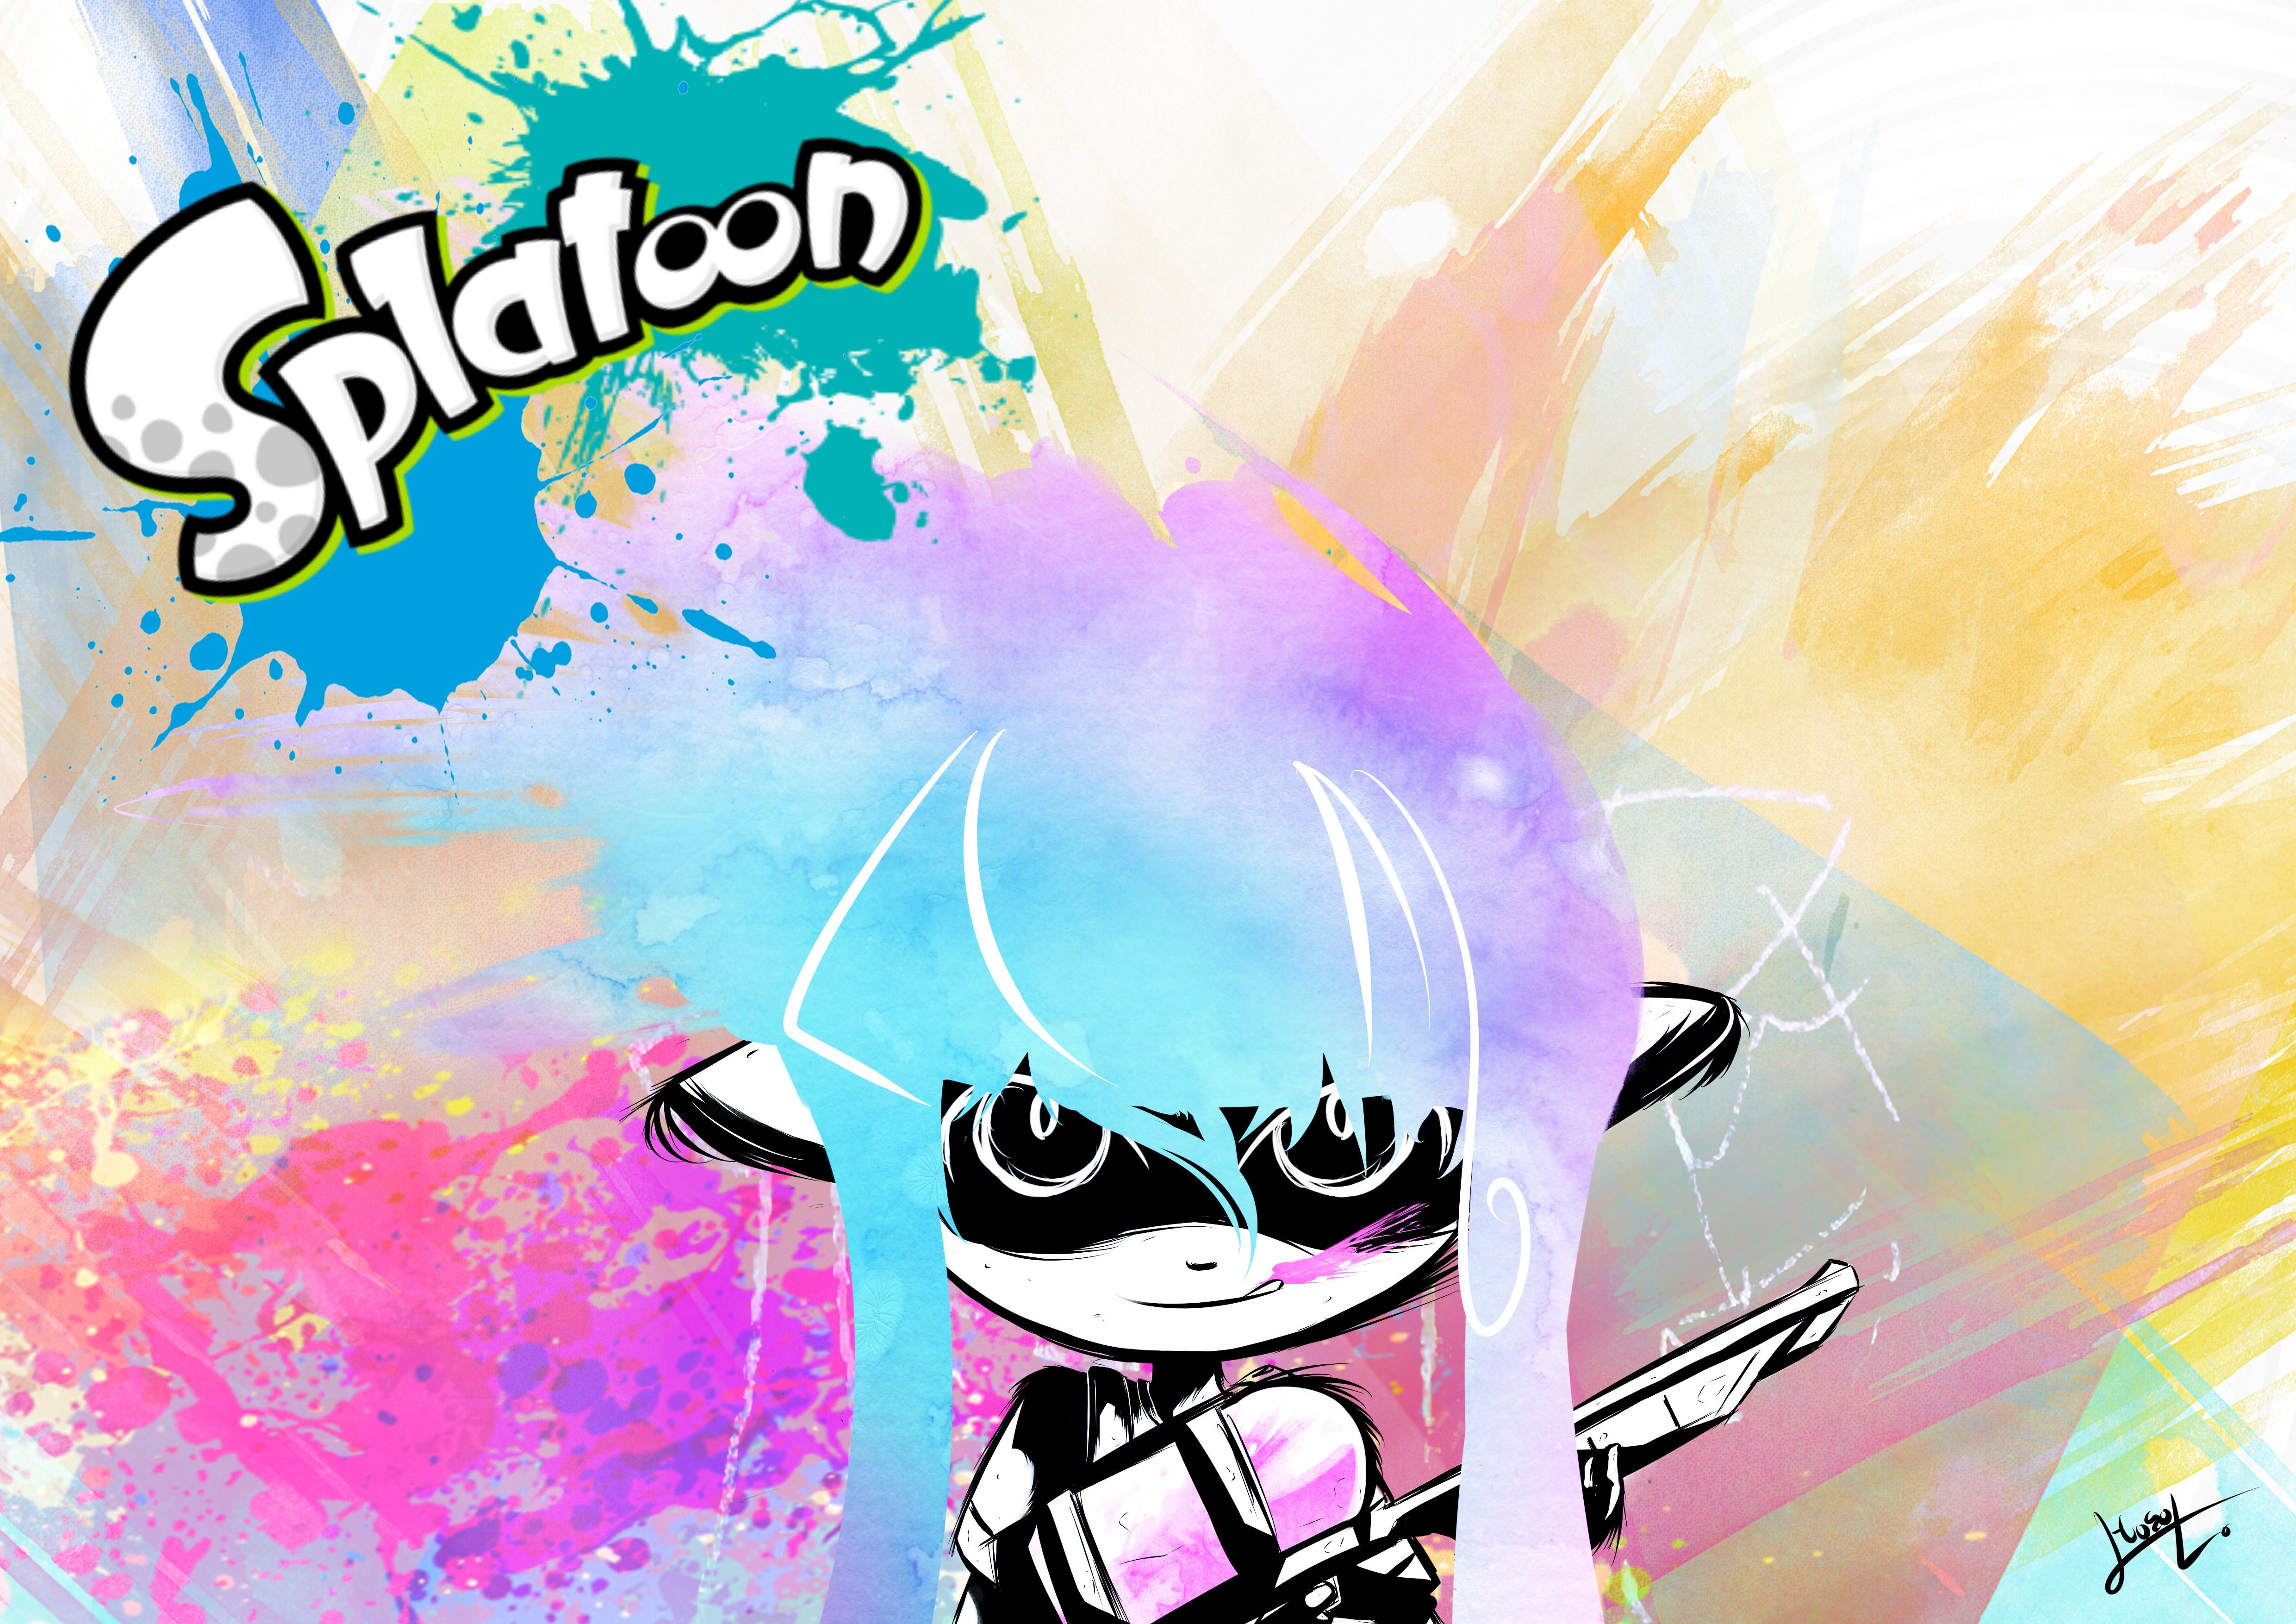 splatoon 1080p high quality 4961x3508.